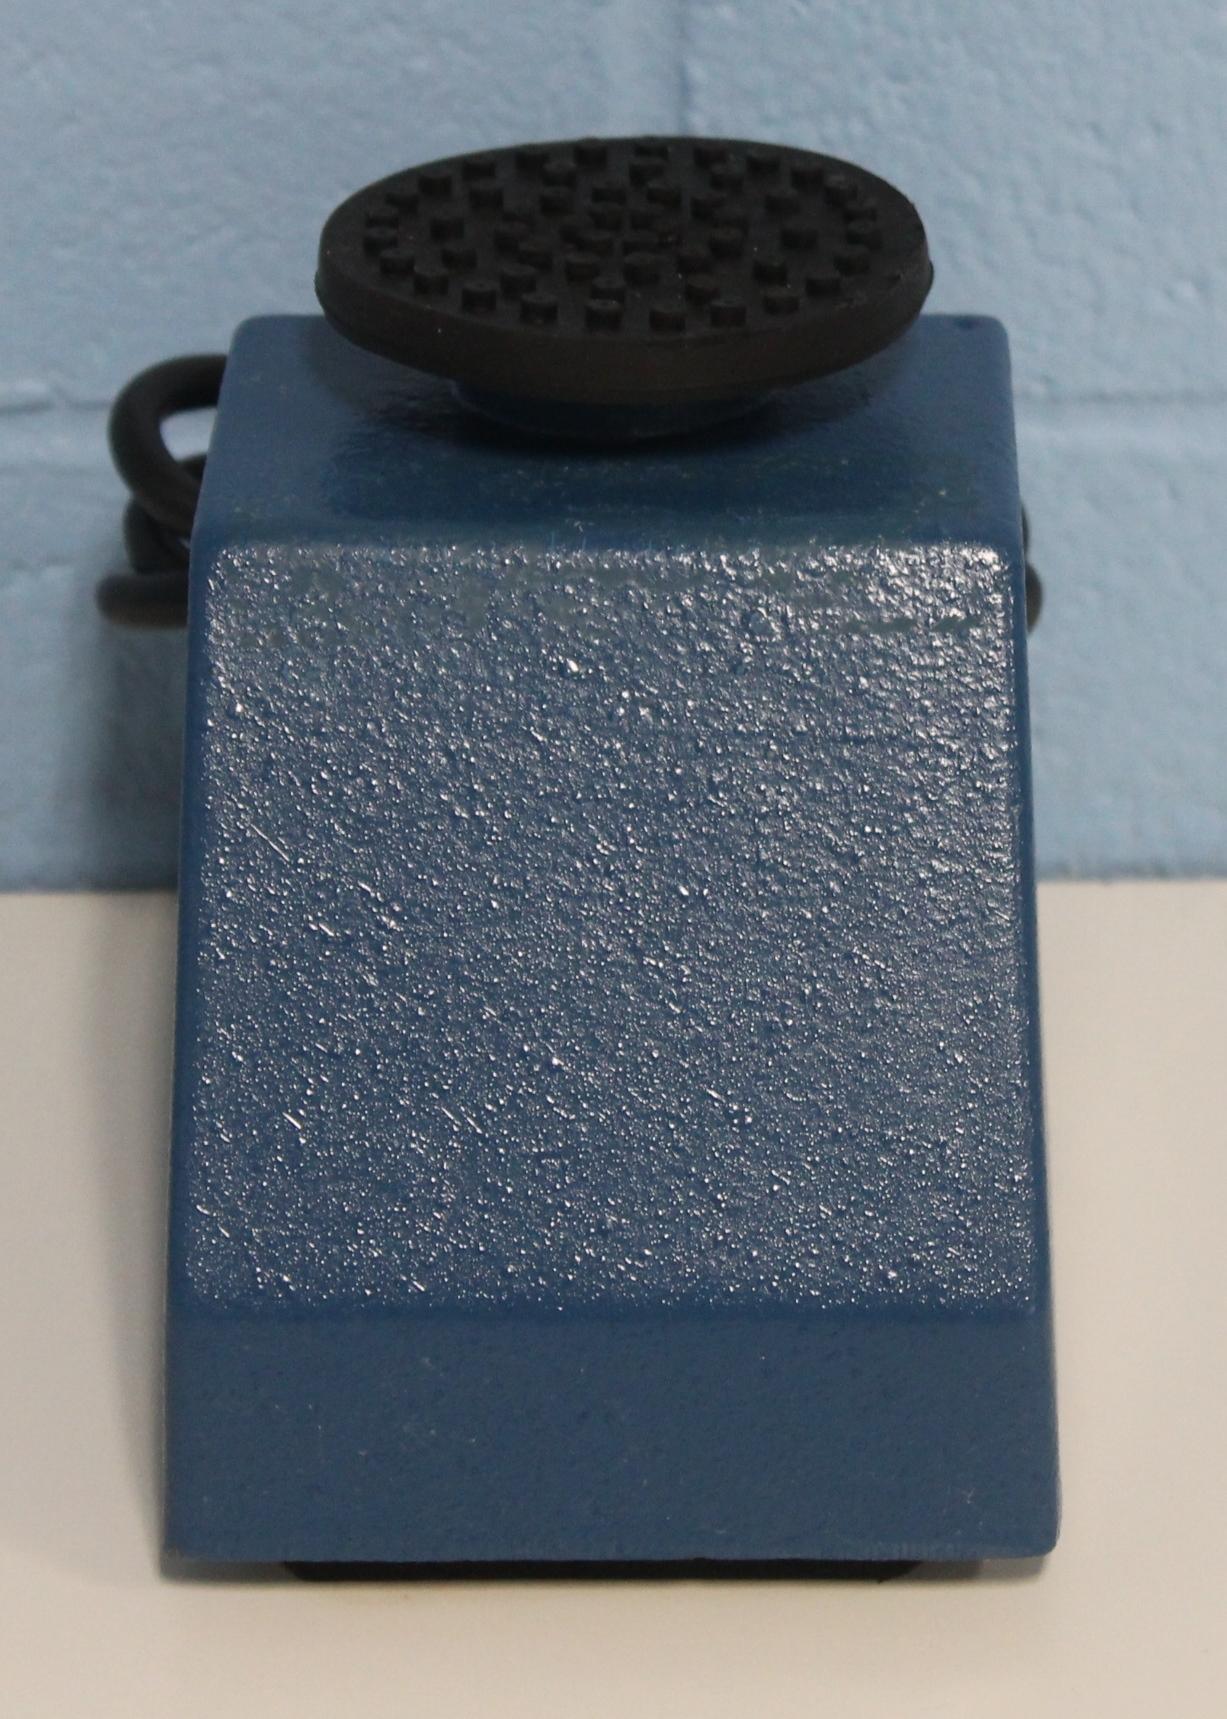 Scientific Industries AB1A3201 Vortex Mixer Image